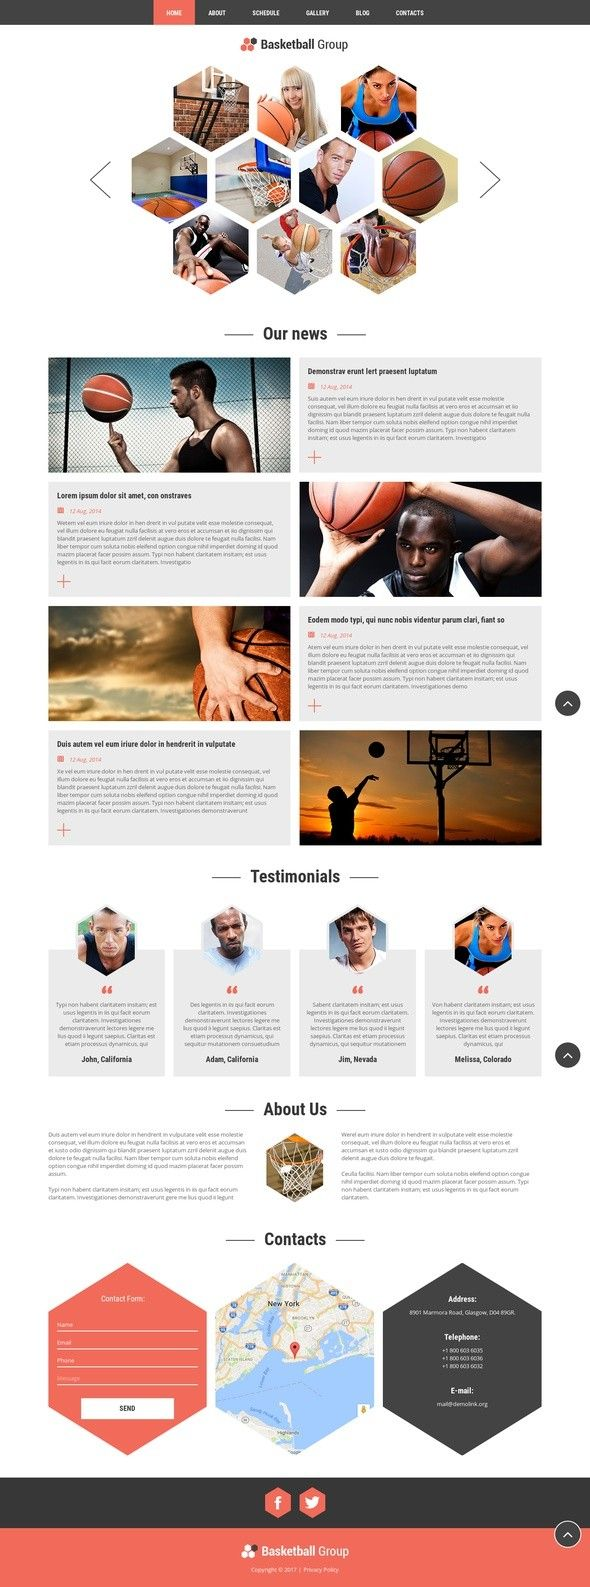 NBA Fan Board Joomla Template CMS & Blog Templates, Joomla Templates, Sports, Outdoors & Travel, Sport Templates, More Sports, Basketball Templates